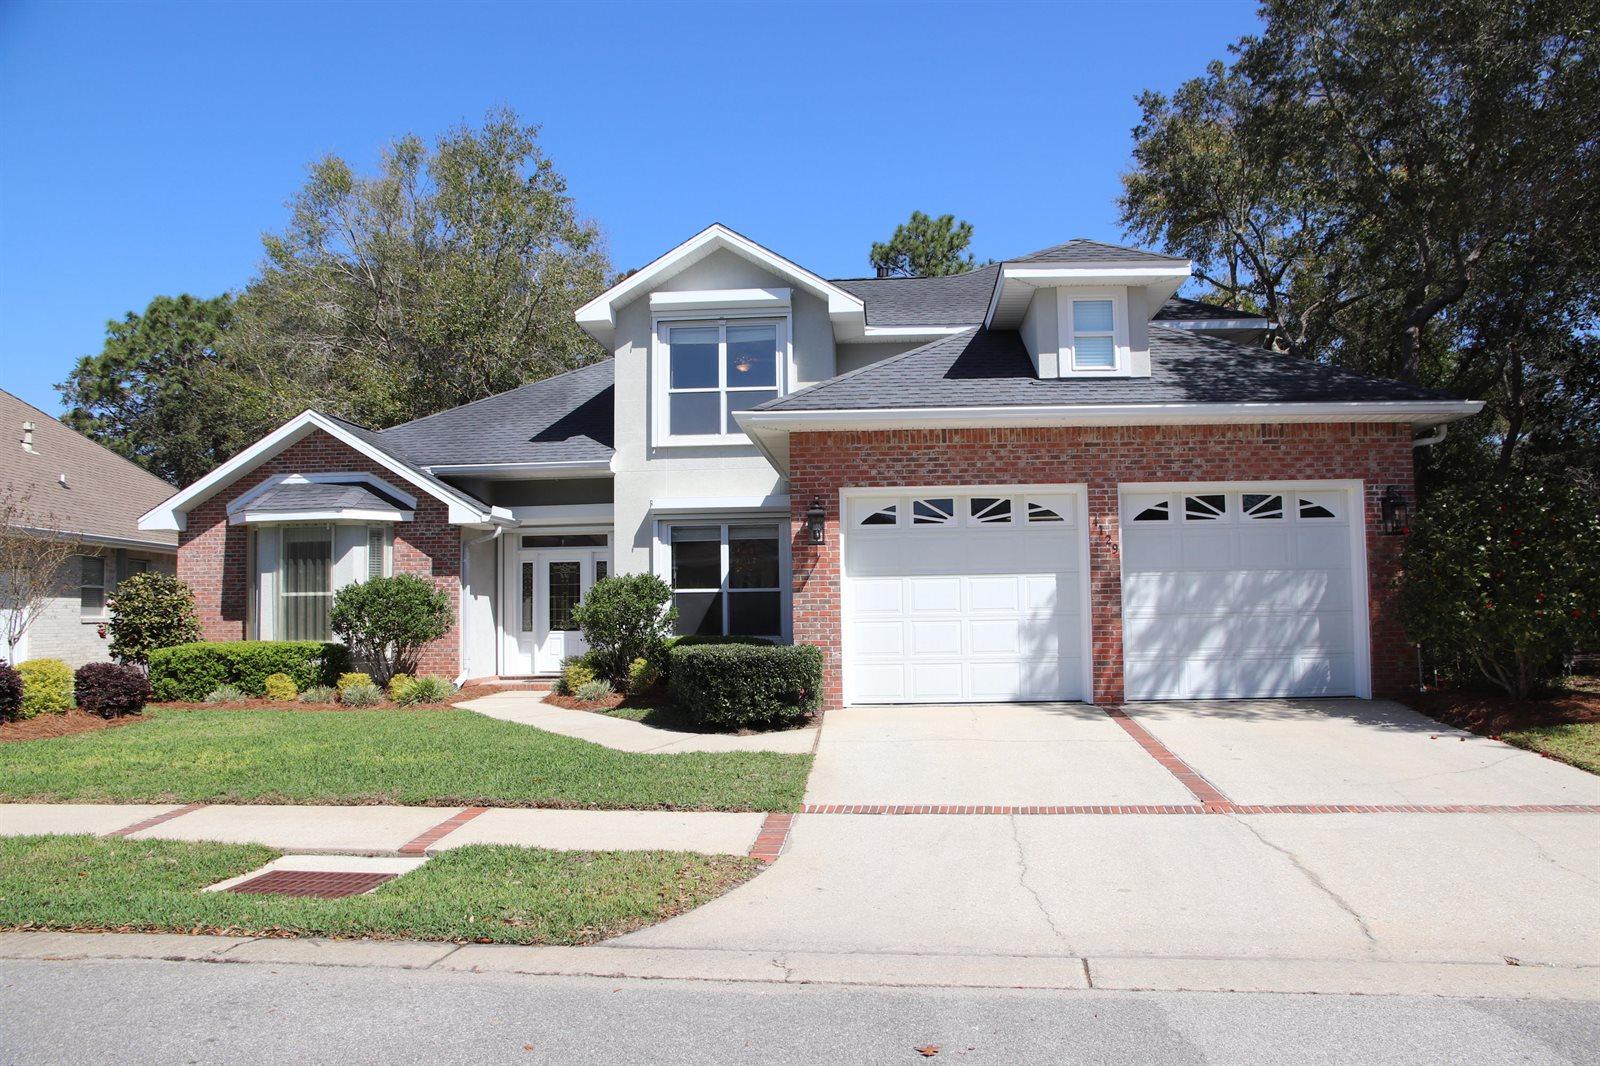 4129 Callaway Drive, Niceville, FL 32578